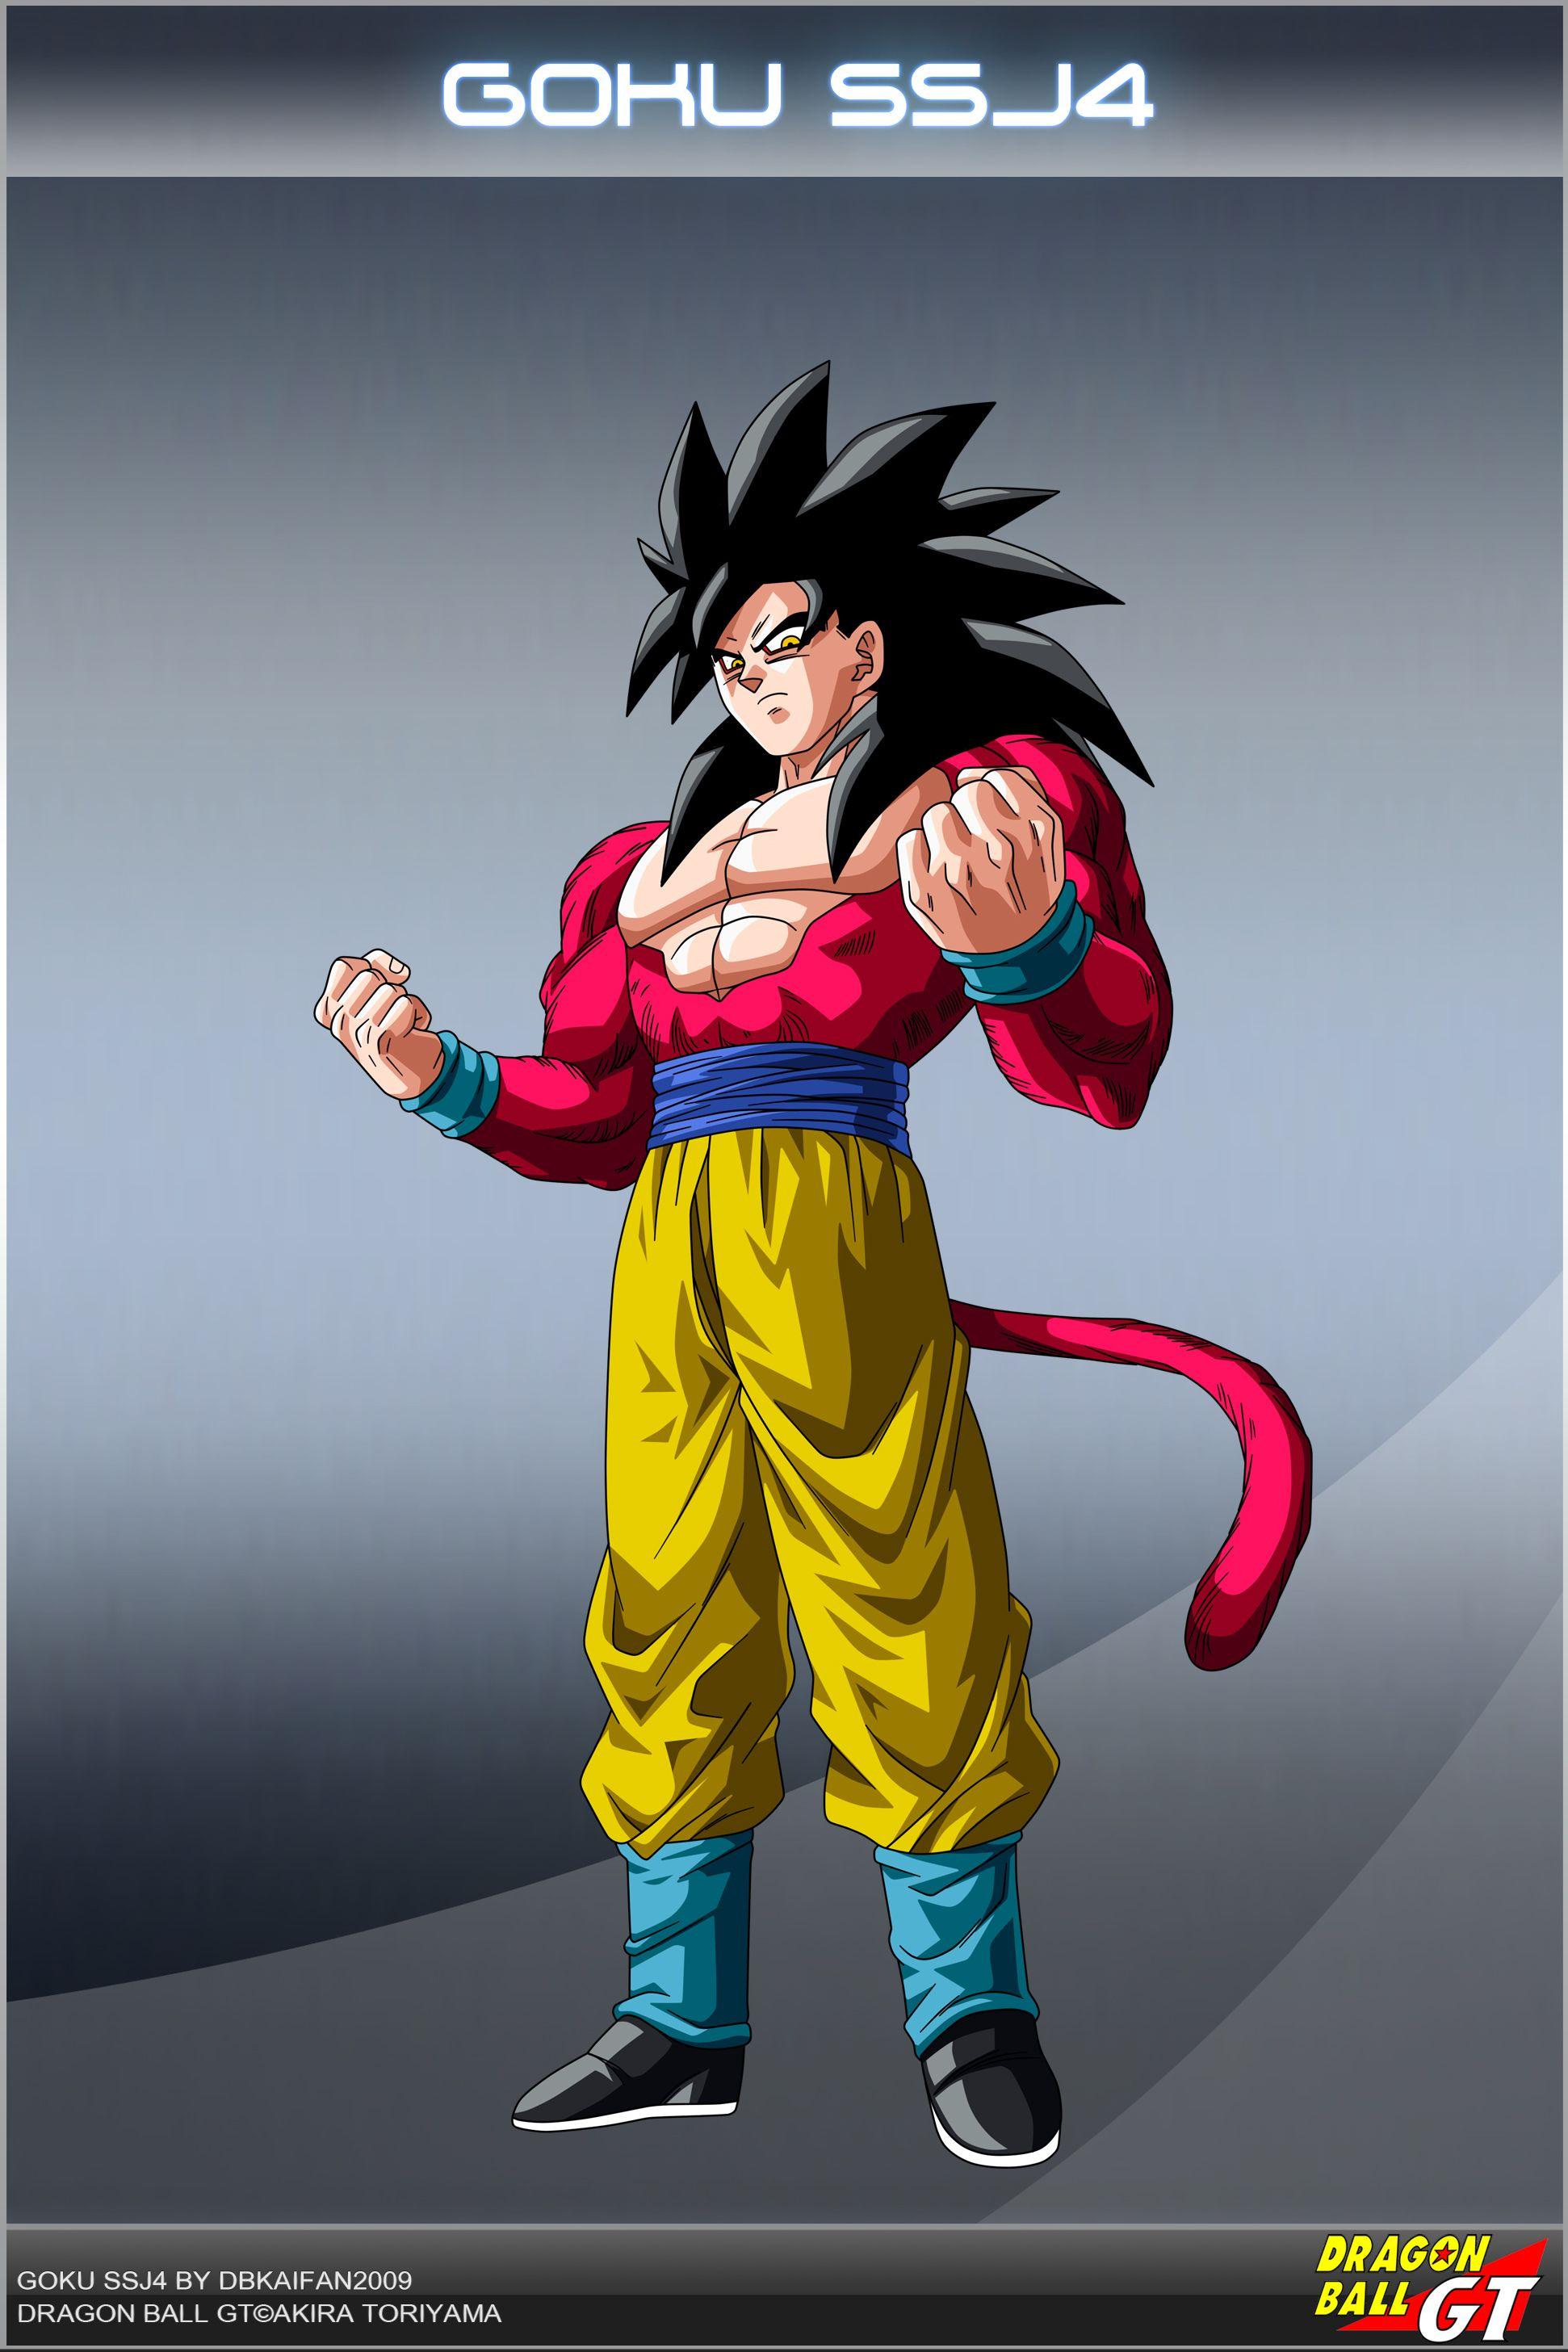 Dragon Ball GT - Goku SSJ4 OS by DBCProject on DeviantArt | series ...